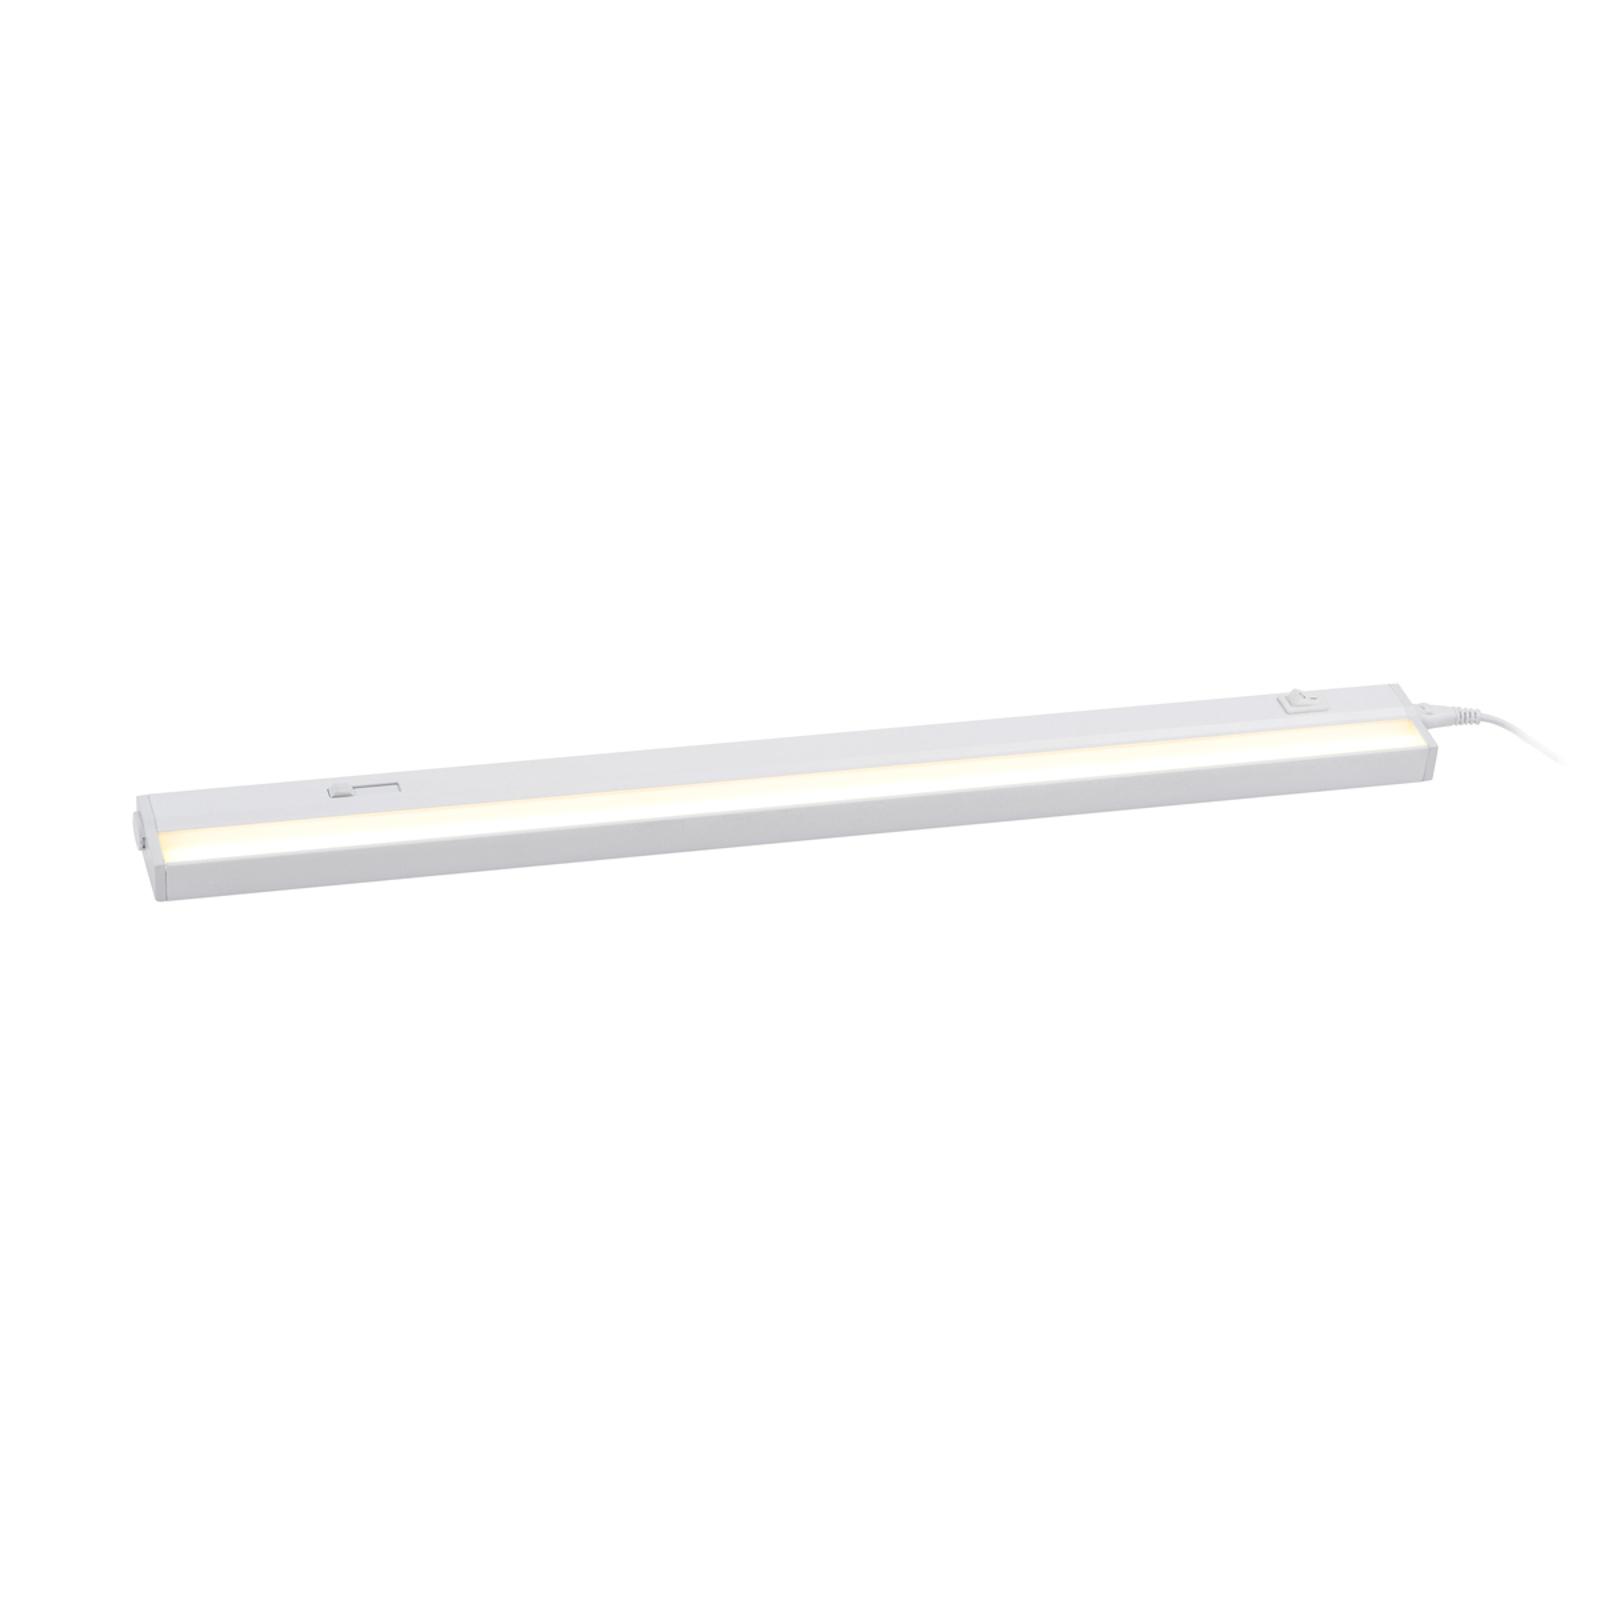 LED-kaapinalusvalaisin Cabinet Light 42,4 cm